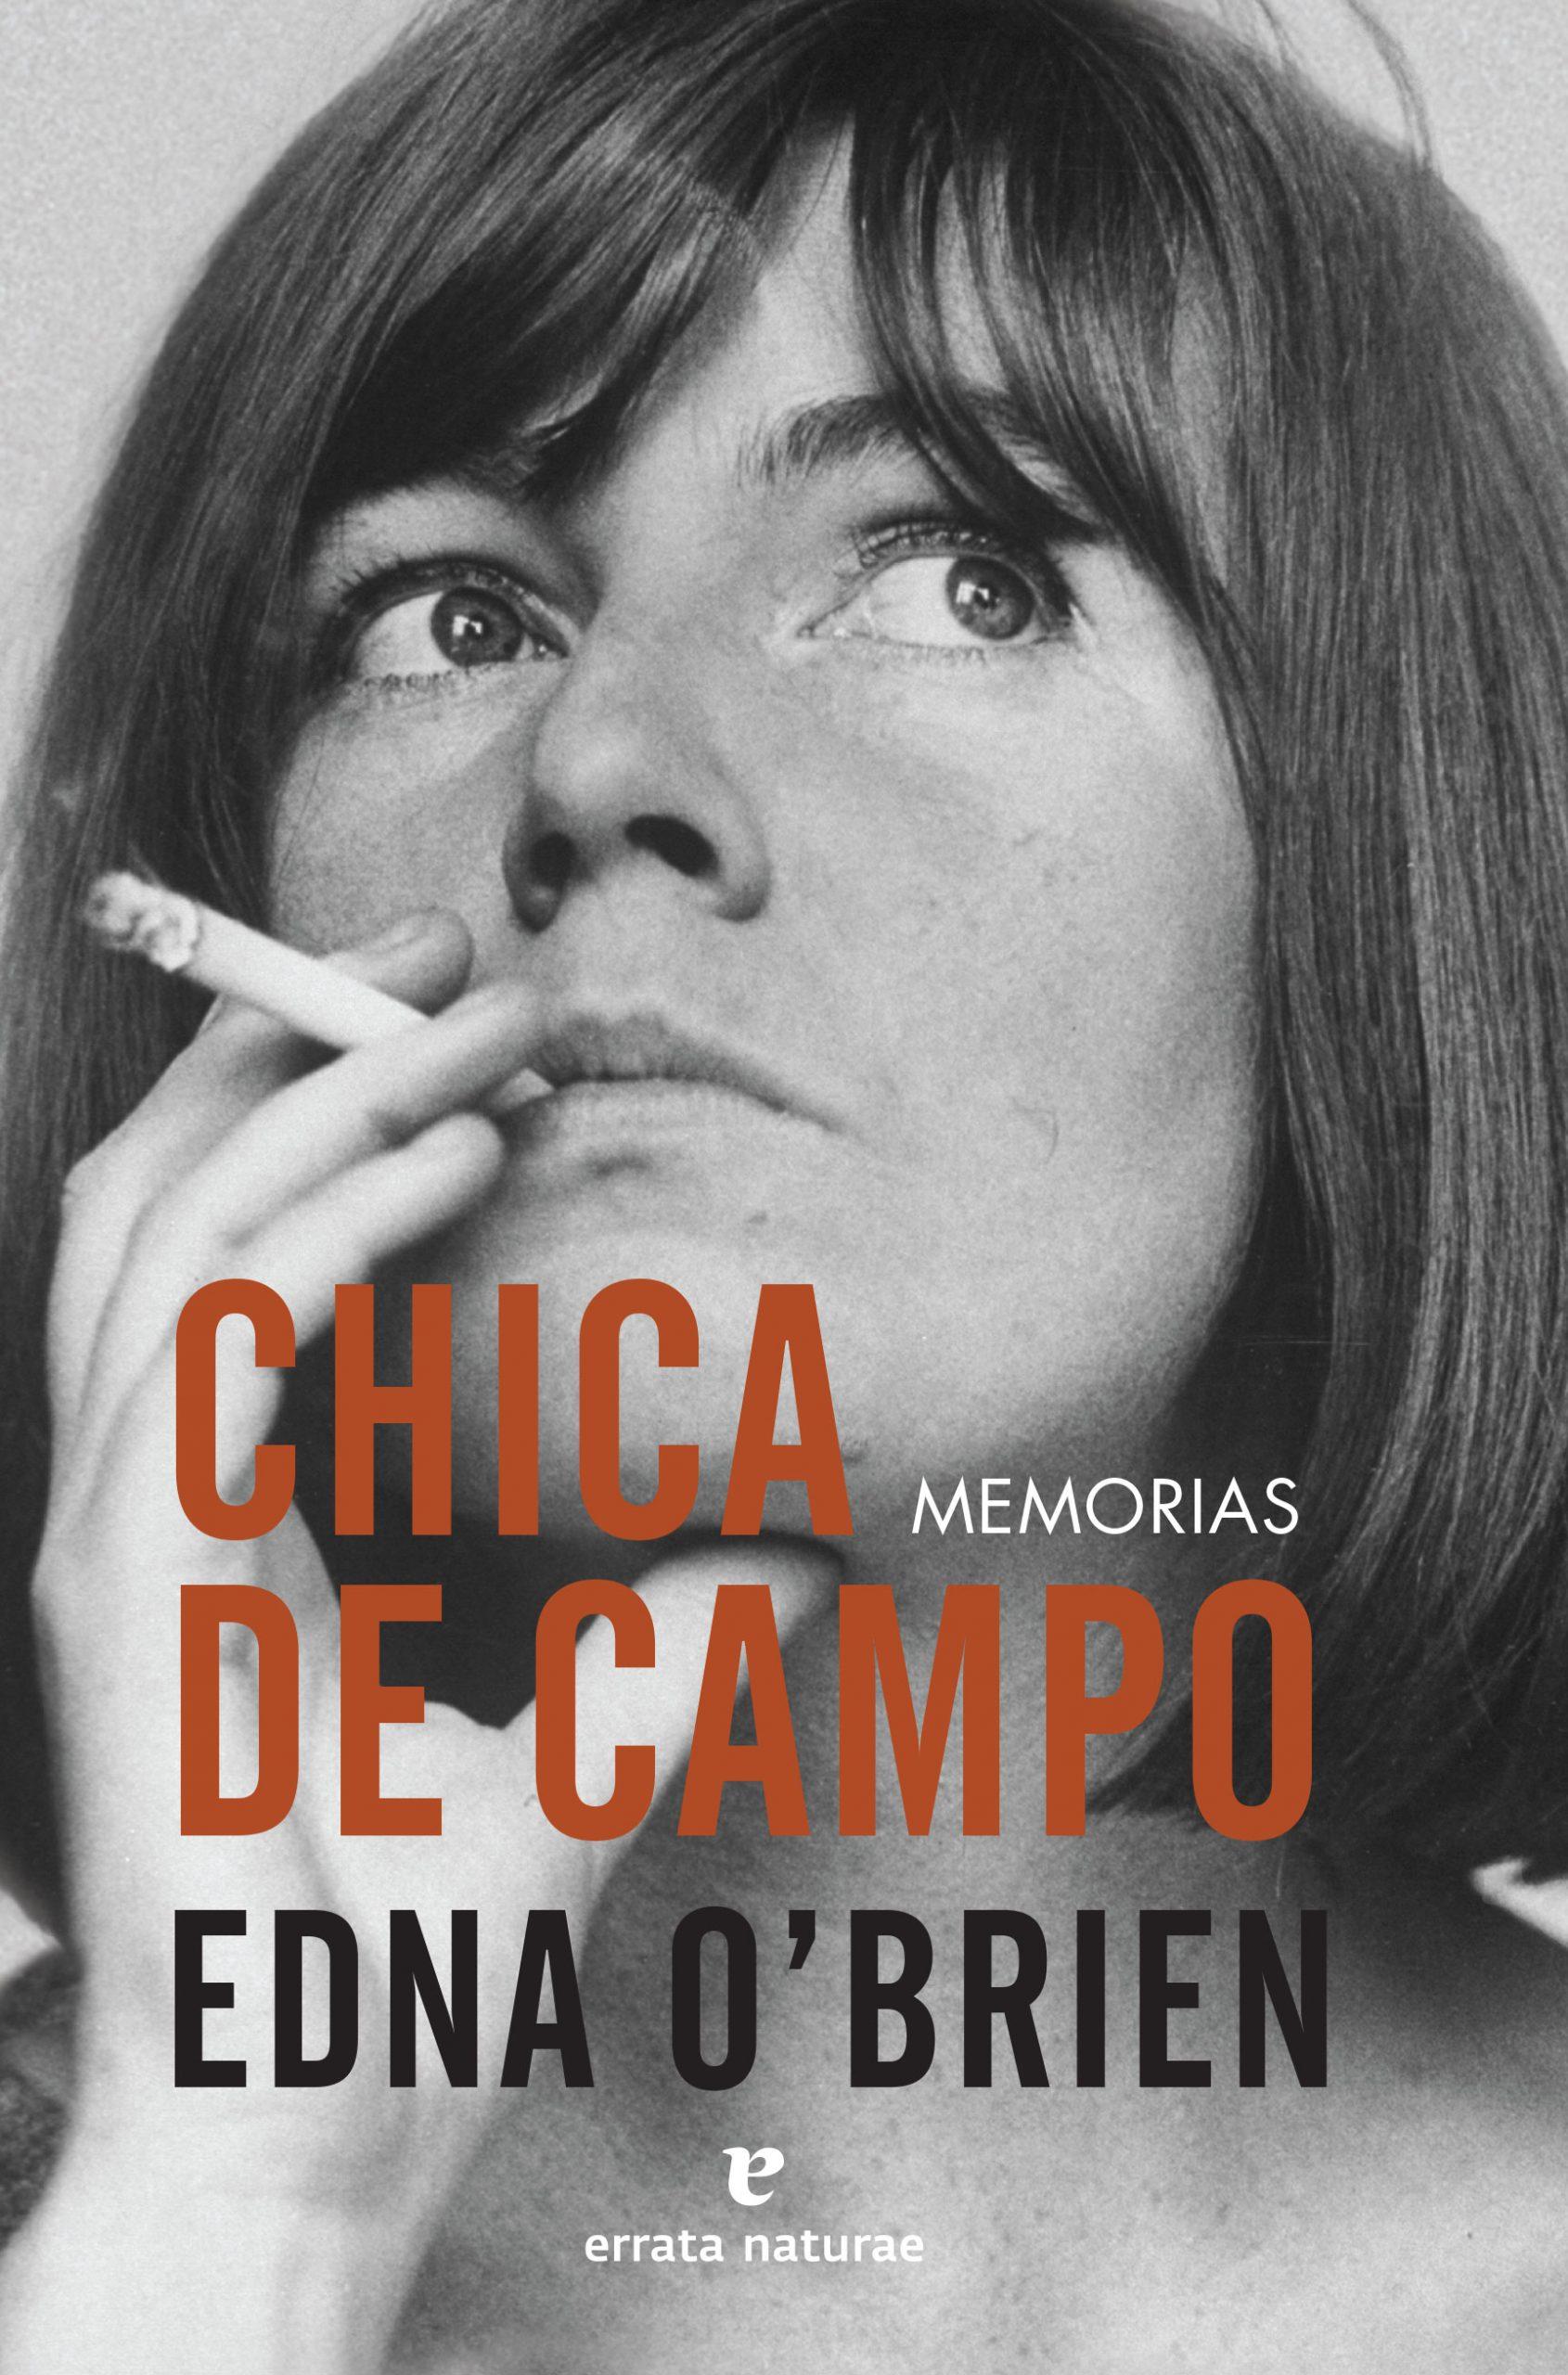 Chica De Campo Errata Naturae Editores